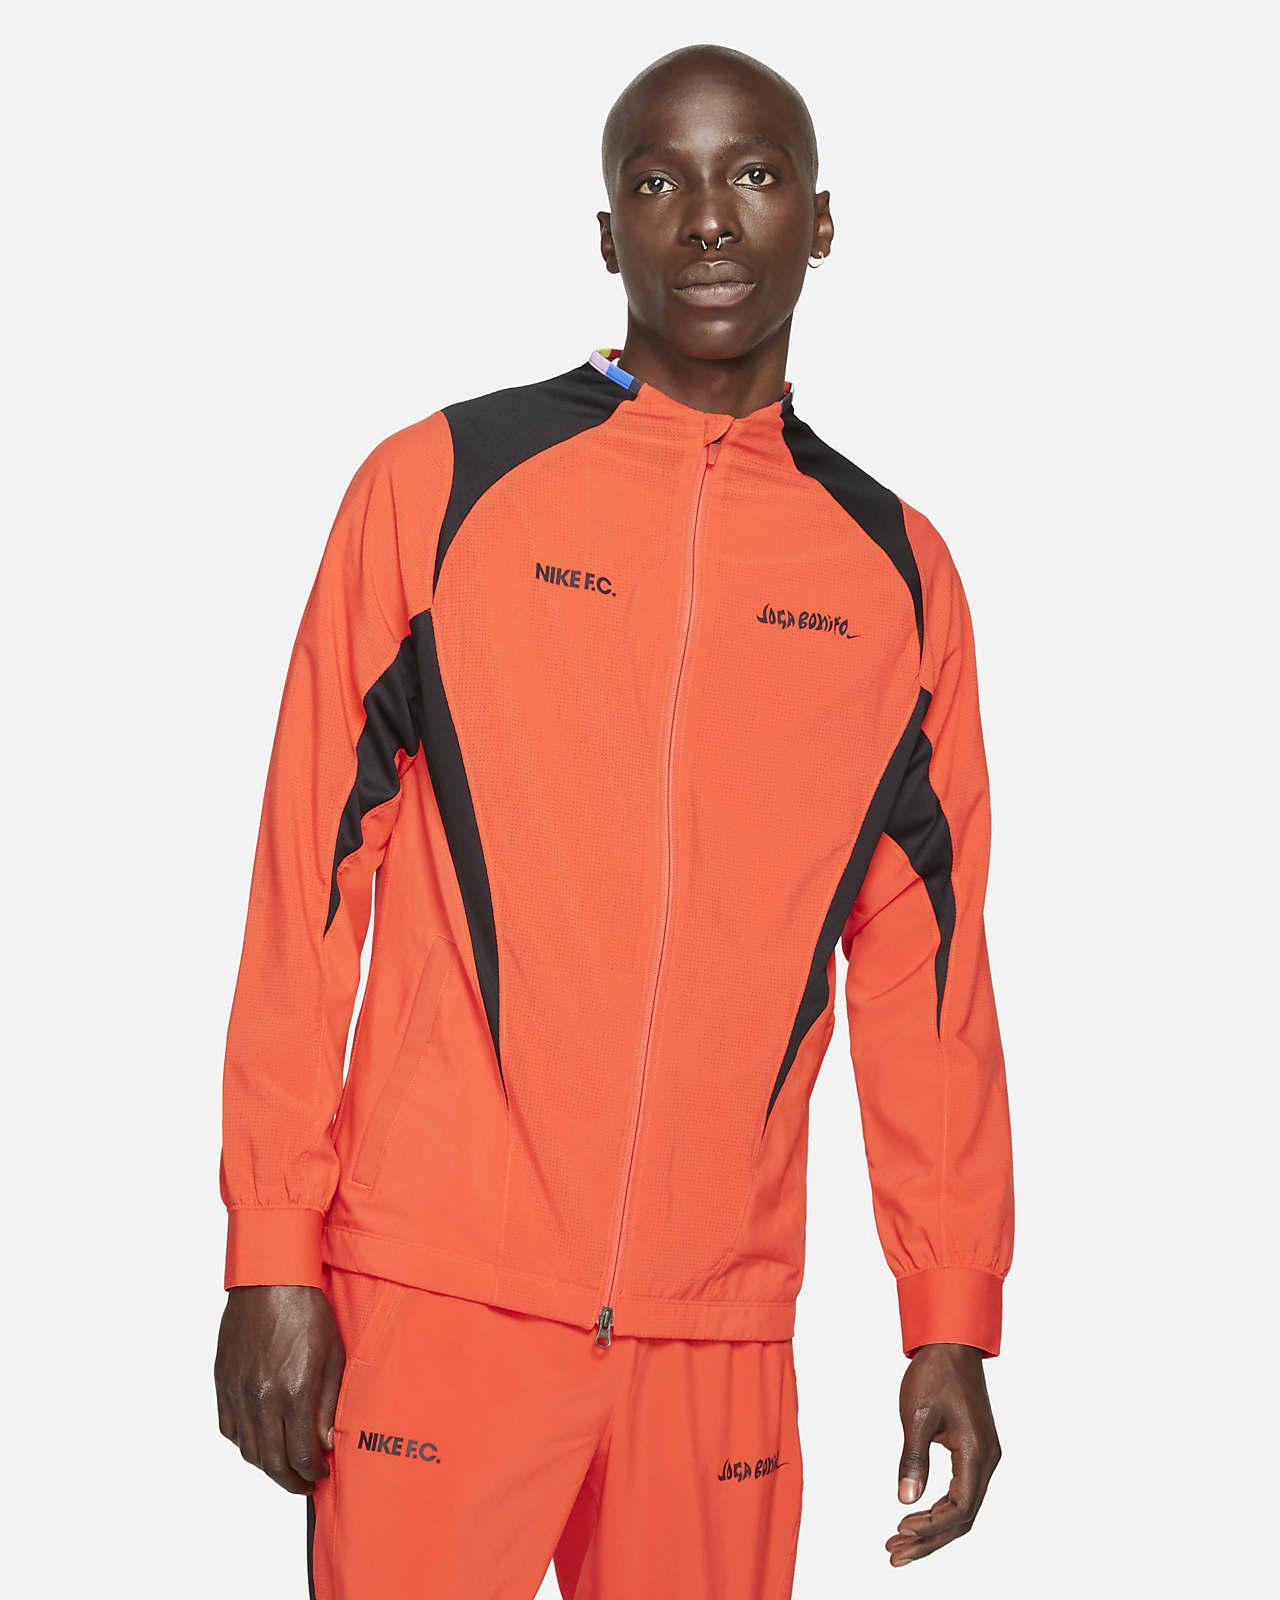 Giacca da calcio in tessuto Nike F.C. - Uomo